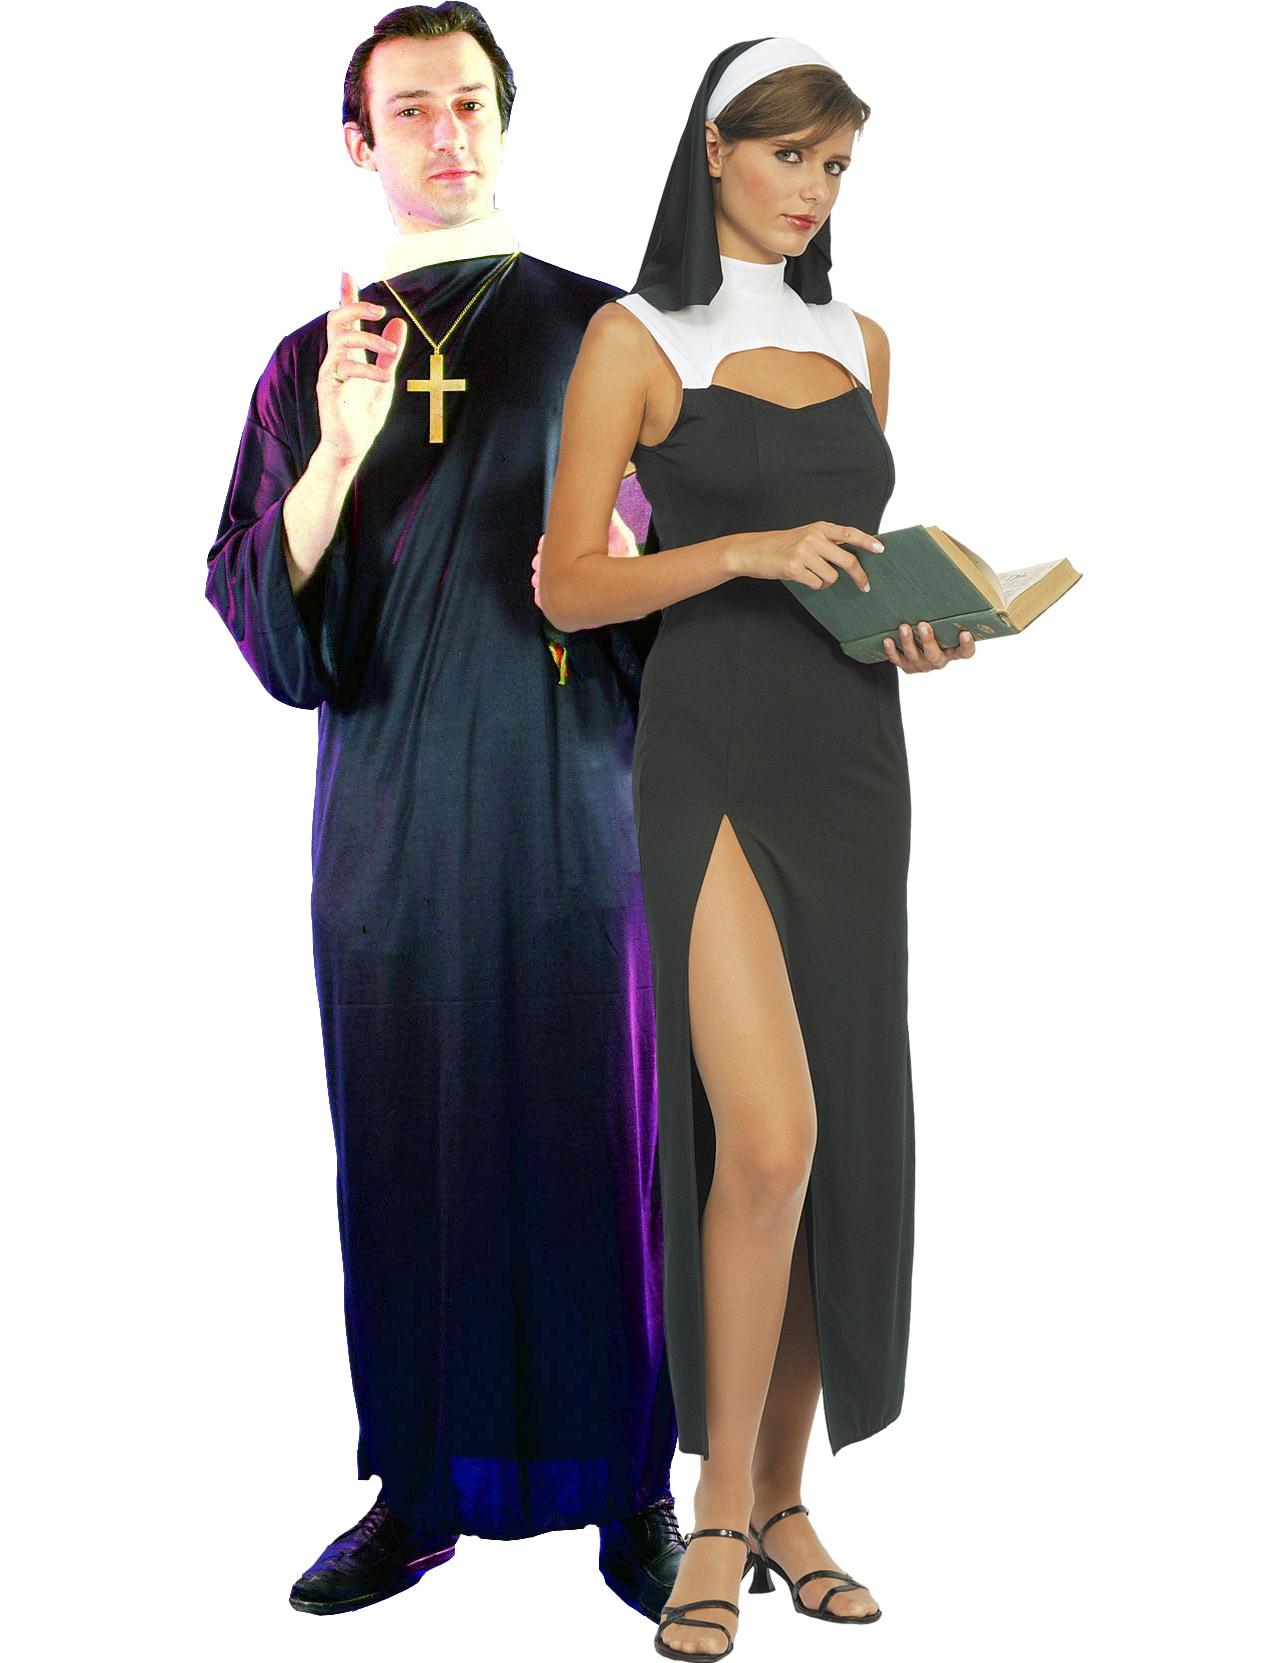 Priester hat Sex mit Nonne